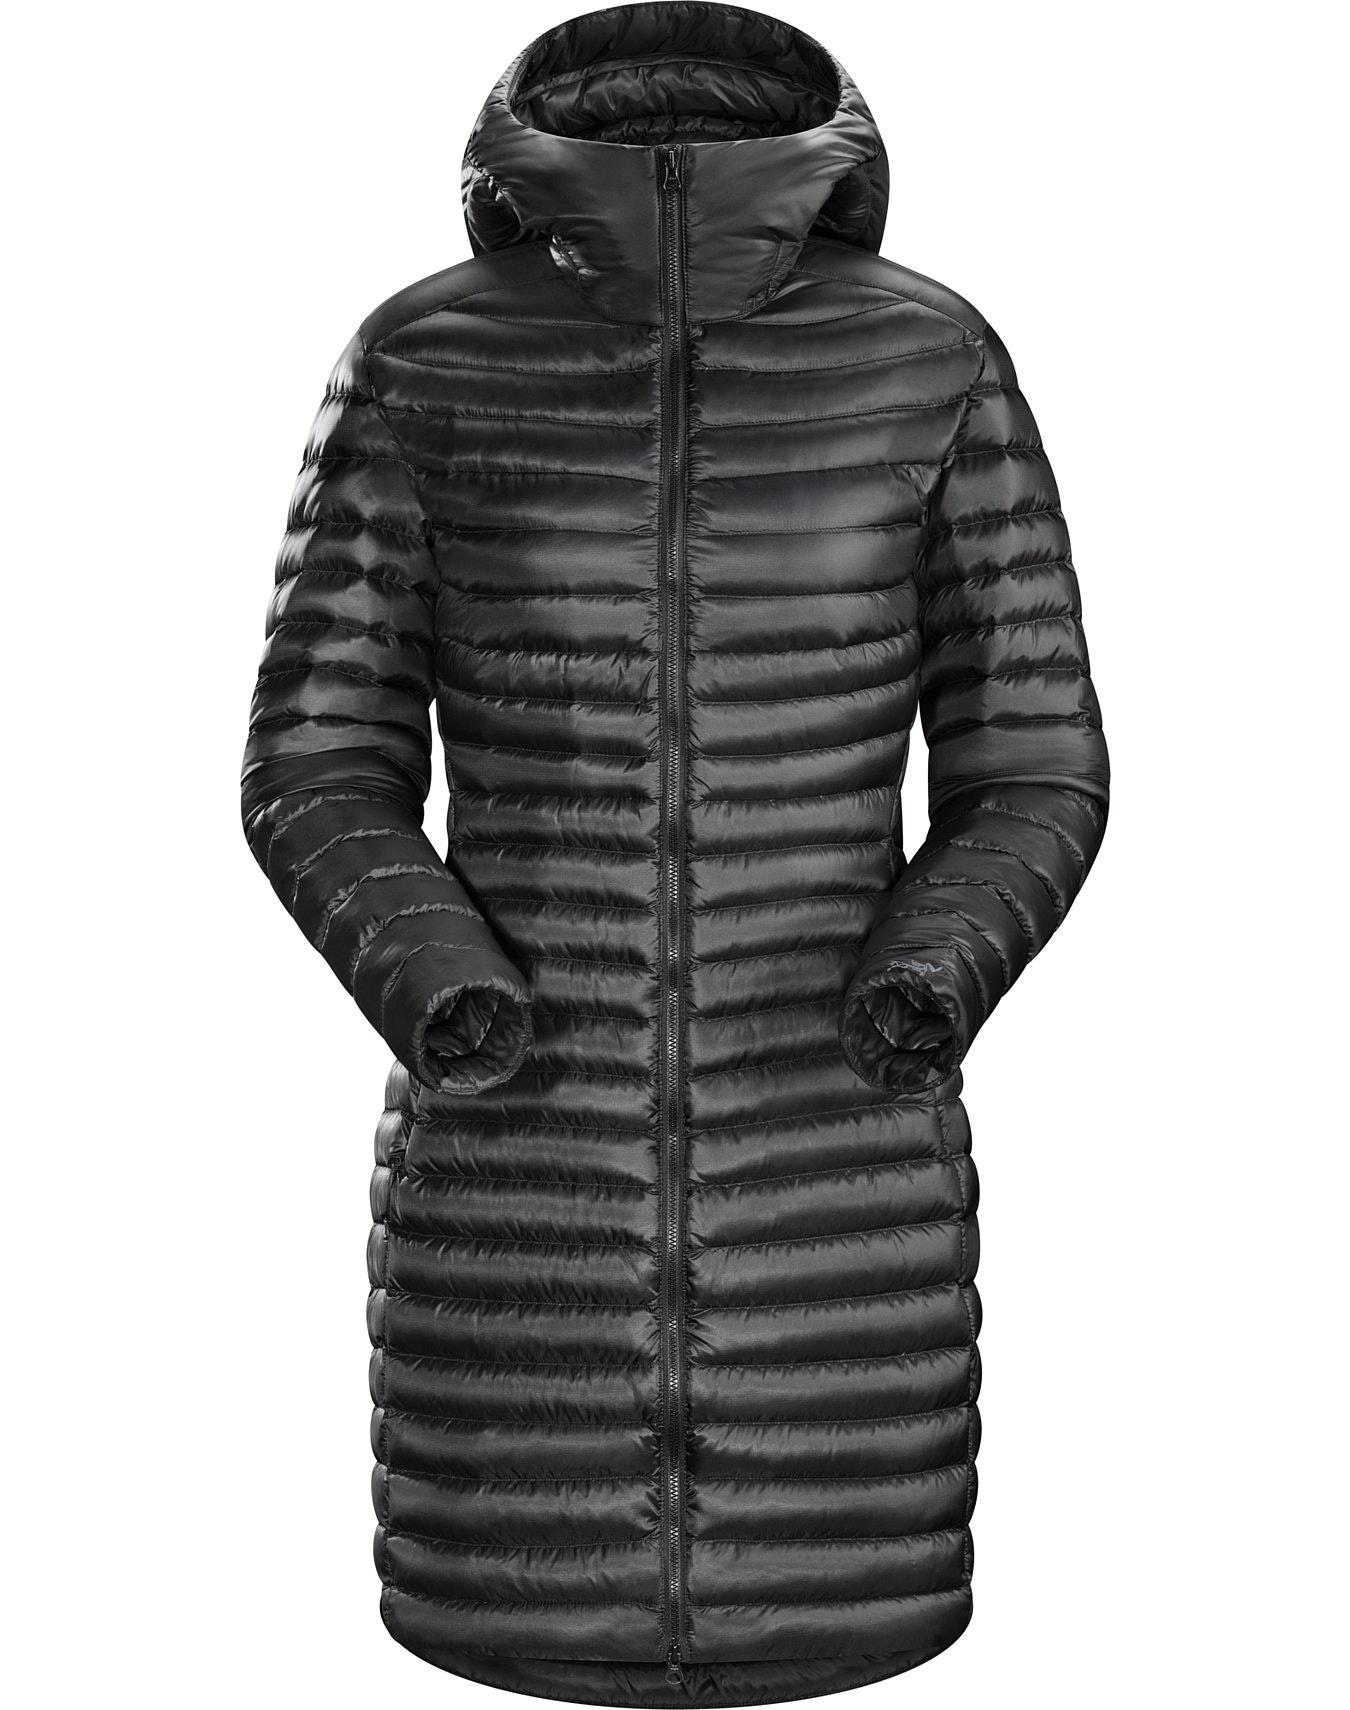 ARCTERYX Arc'teryx W's Nuri Coat